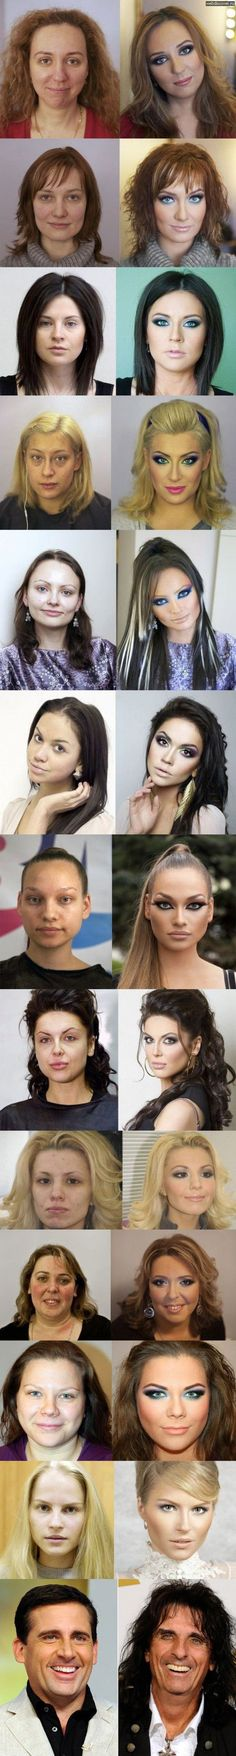 Oh the magic of makeup